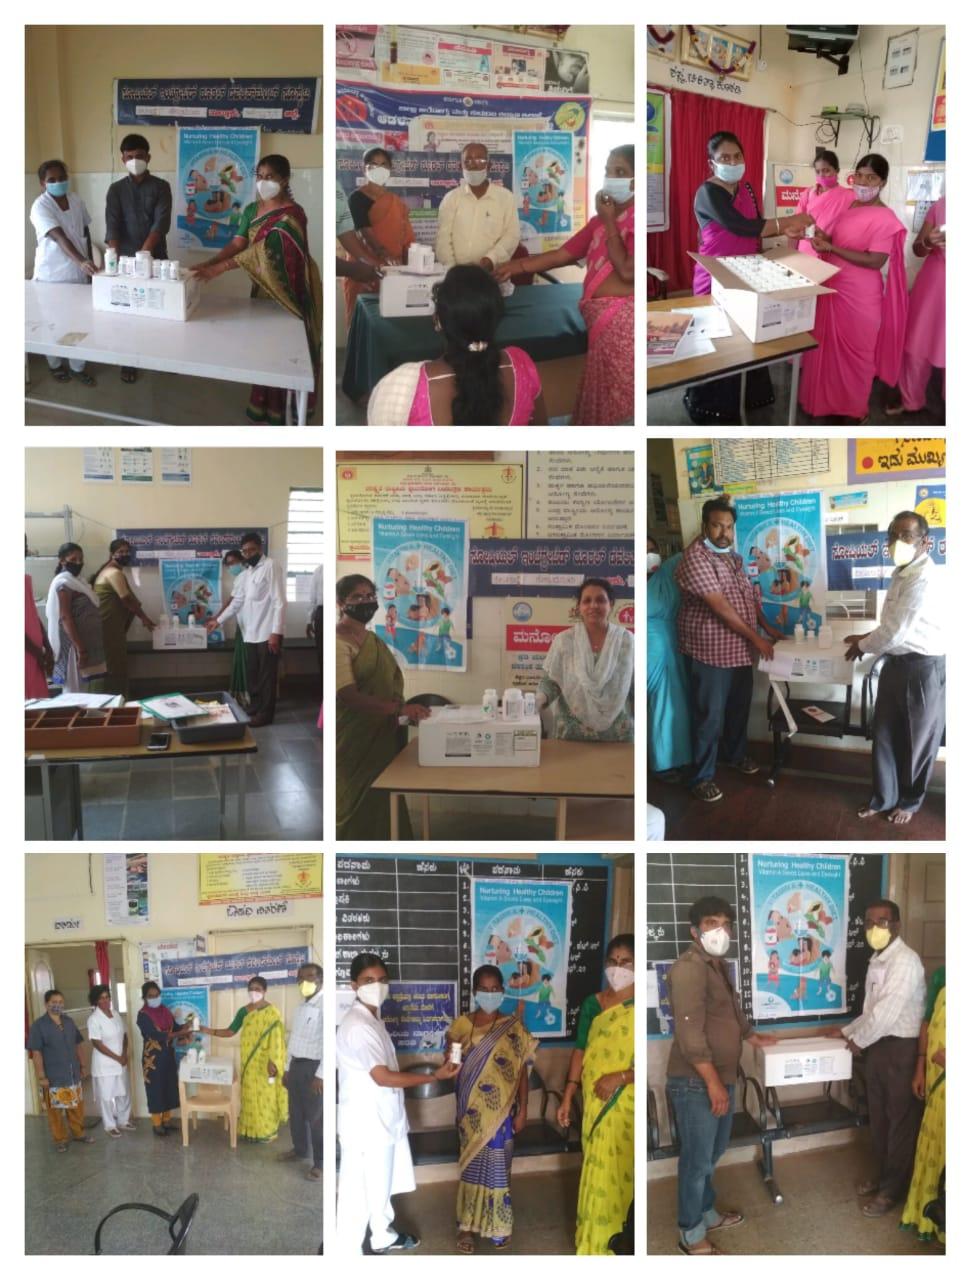 /media/sirds/1NGO-00222-SIRDS-Activities-Medicine_Distribution_at_Hospitals.jpeg